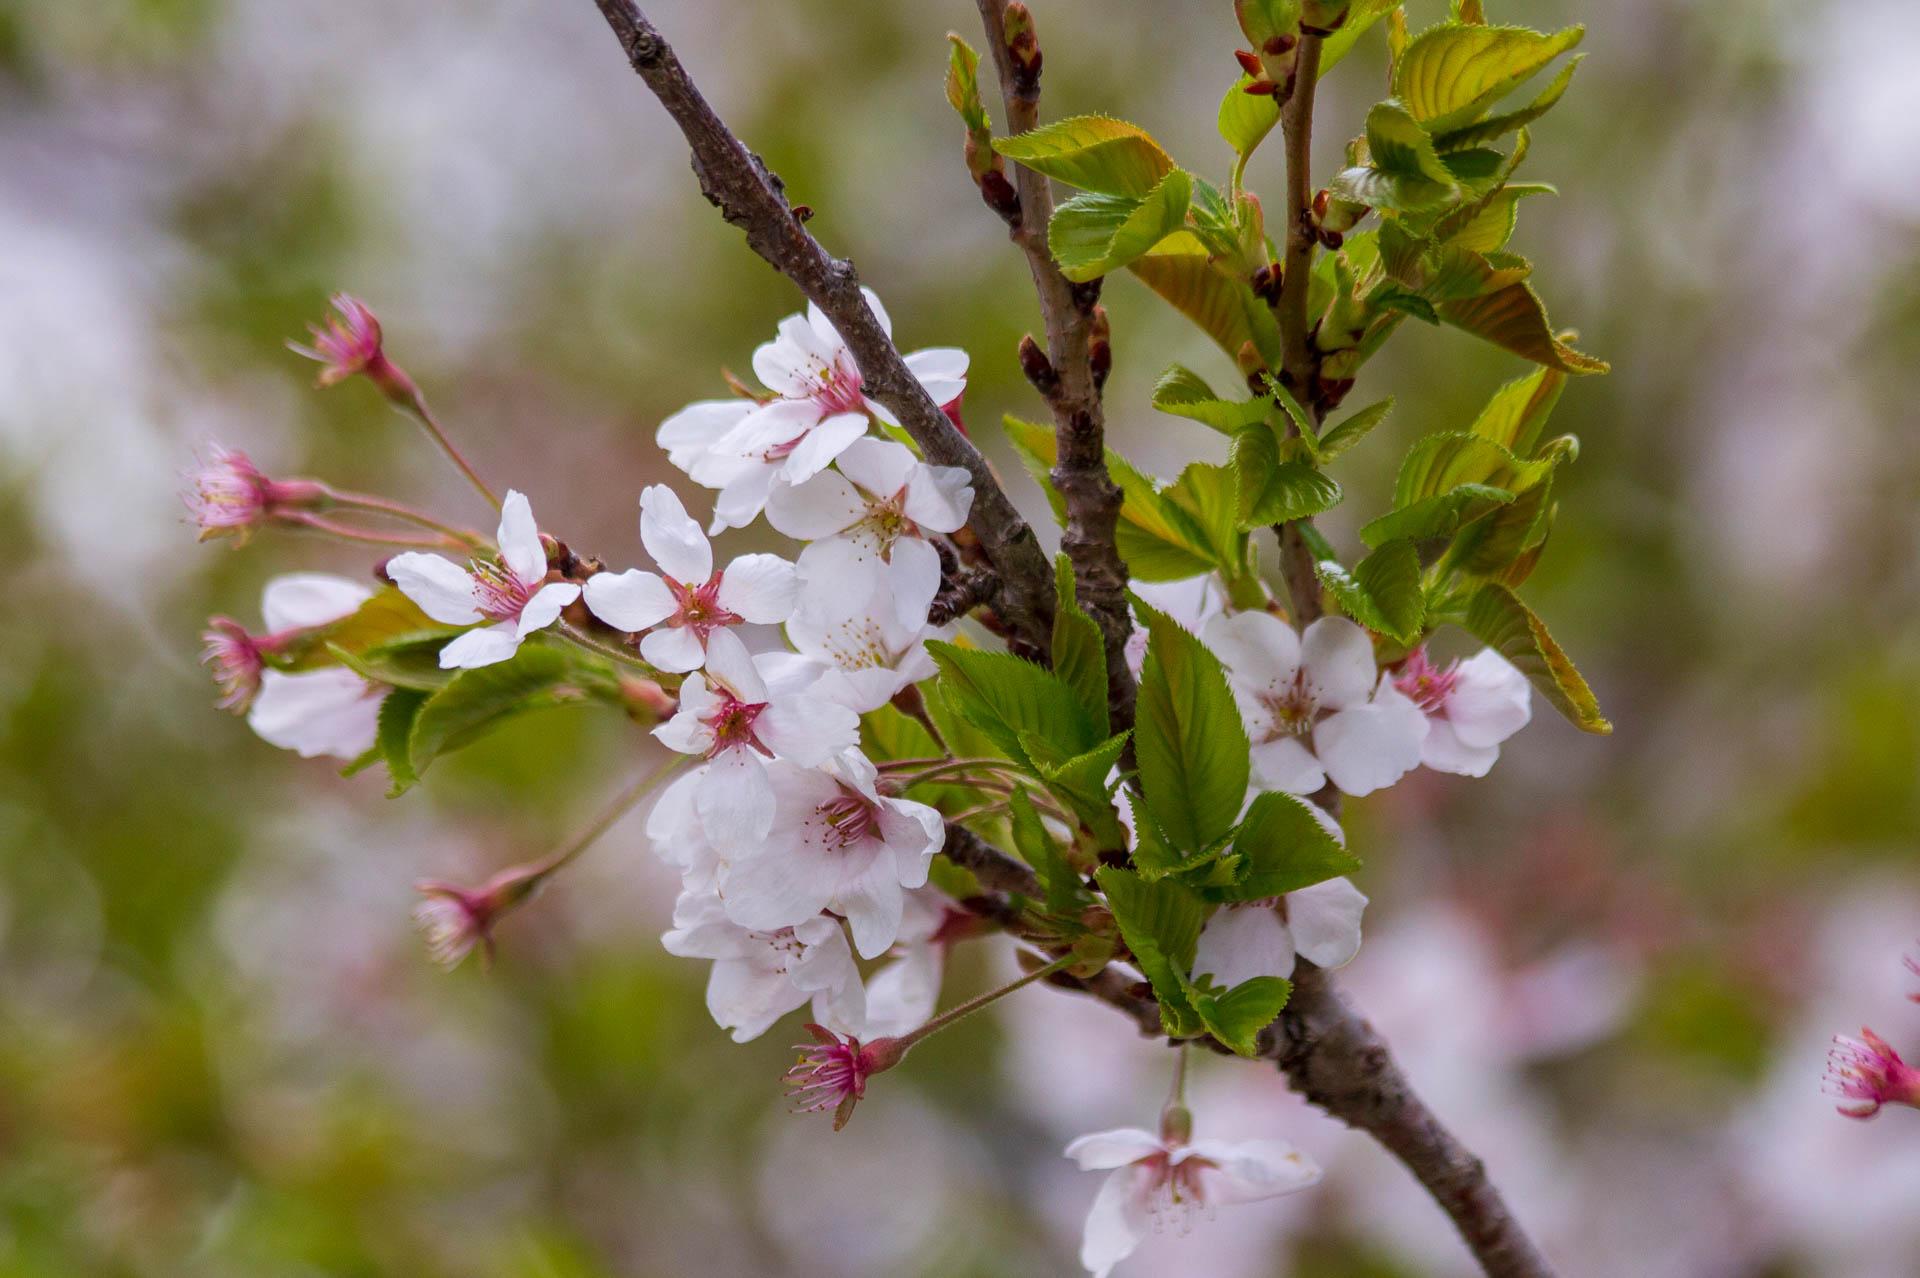 Sakura-Watch-May-10-2018-141.jpg